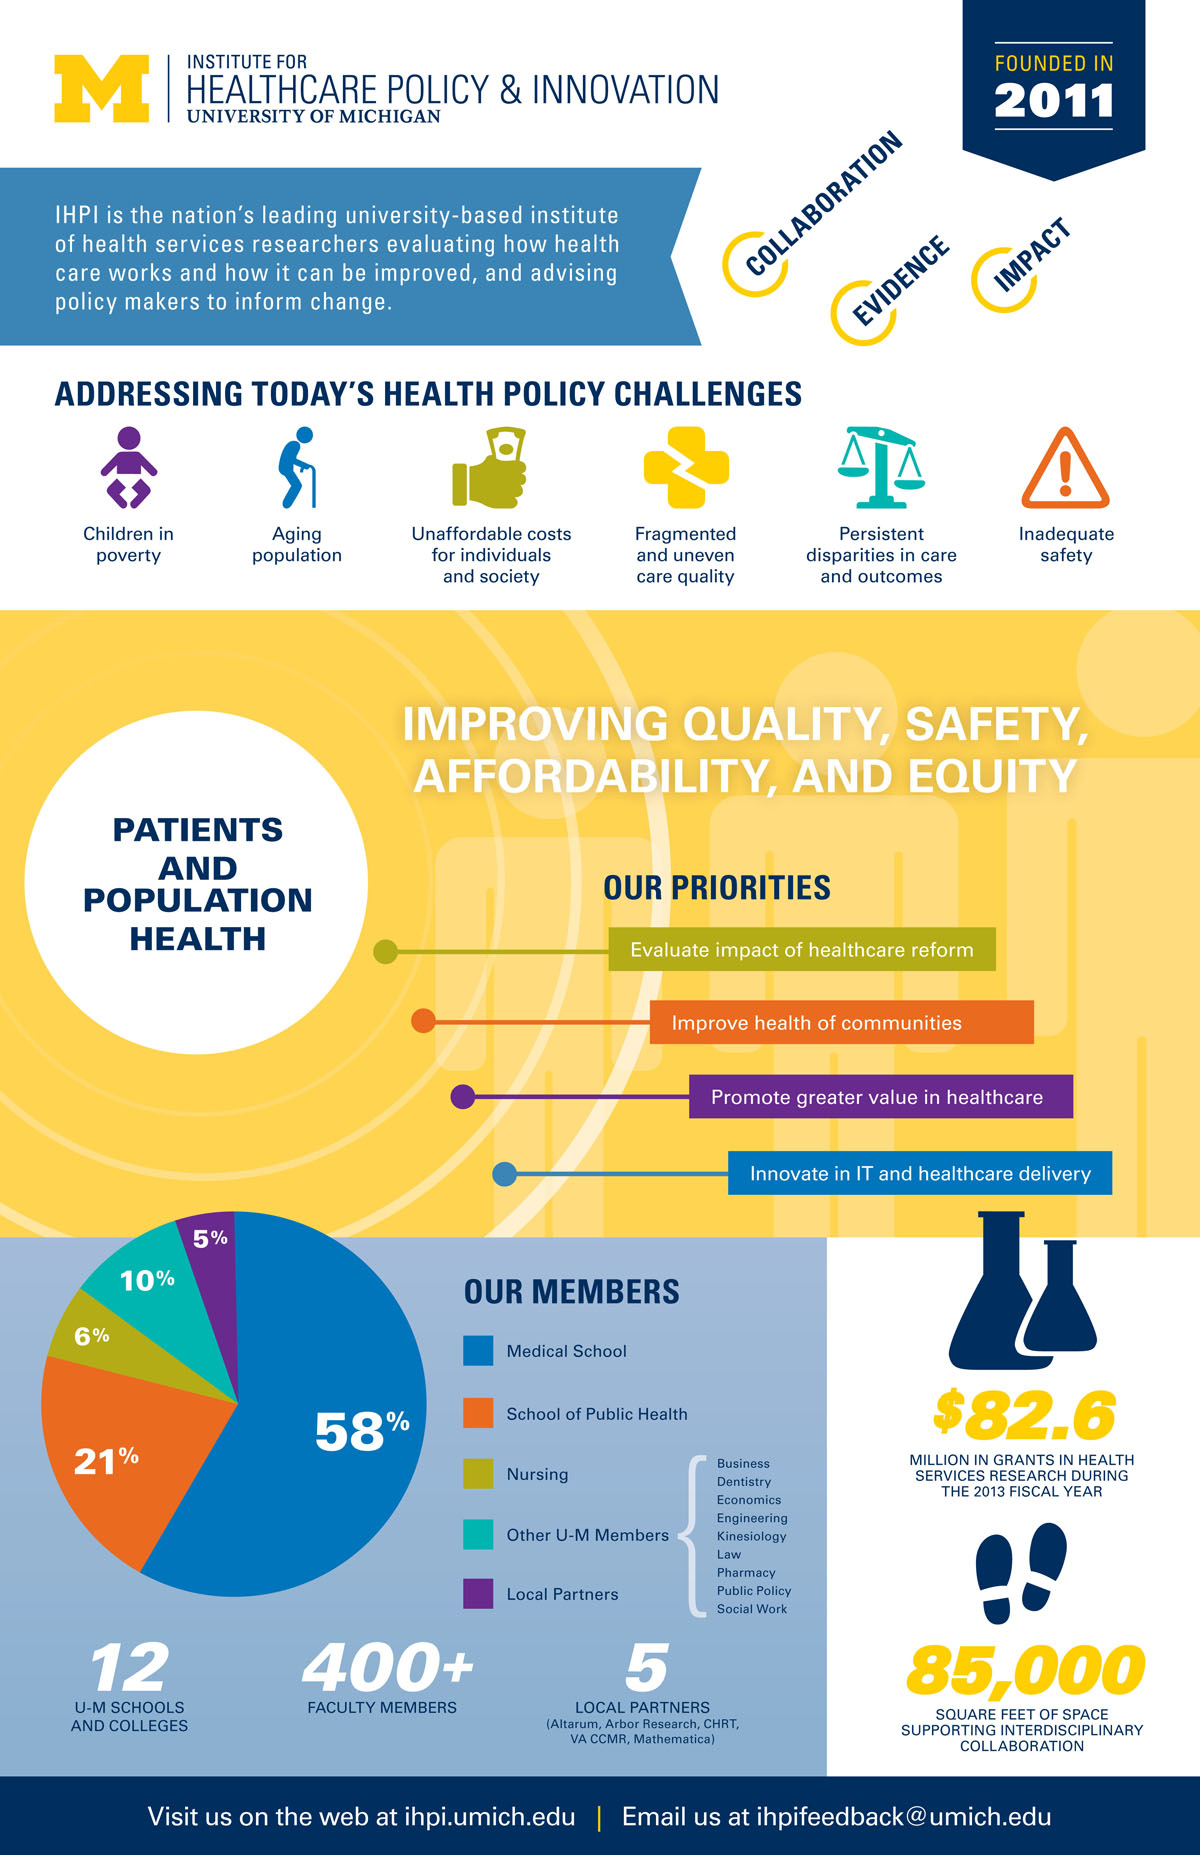 IHPI infographic